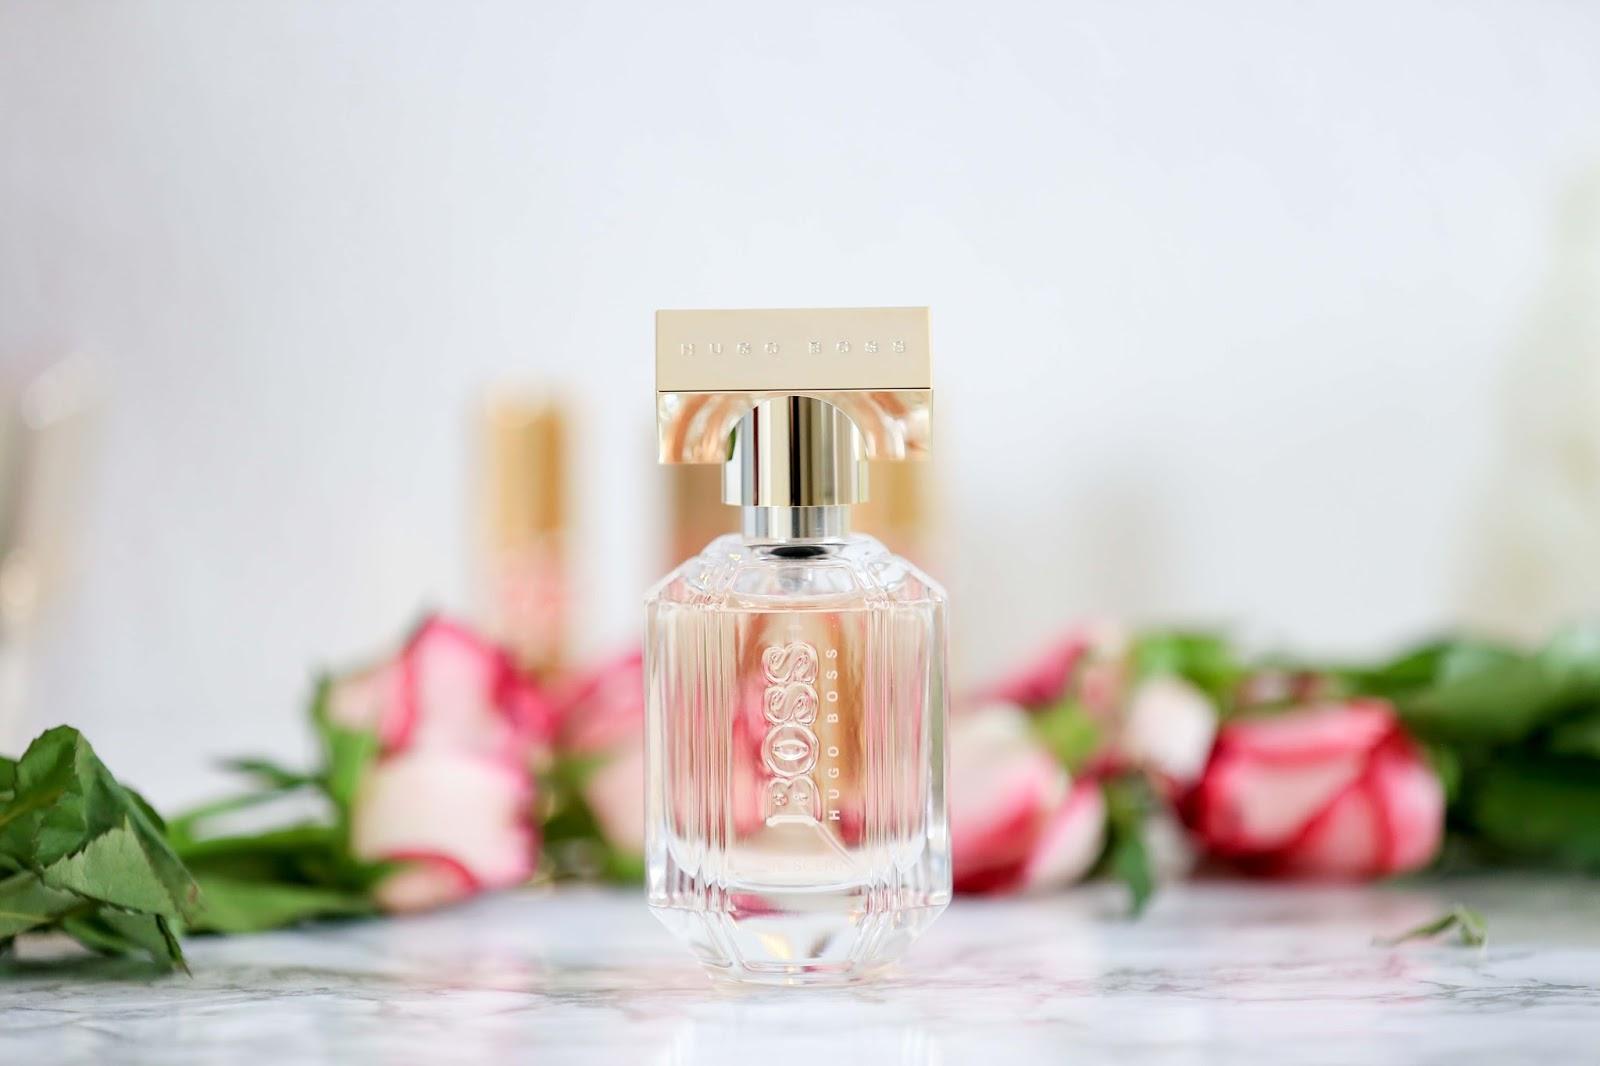 Boss Perfume bewertung-Fashionstylebyjohanna-Beautypost-Beautyblogger-Blogger aus Frankfurt -YSL-YSL Lippenstift- pinker Lippenstift-Pinkpeonies Lippenstift-Lipstik PinkPeaonies